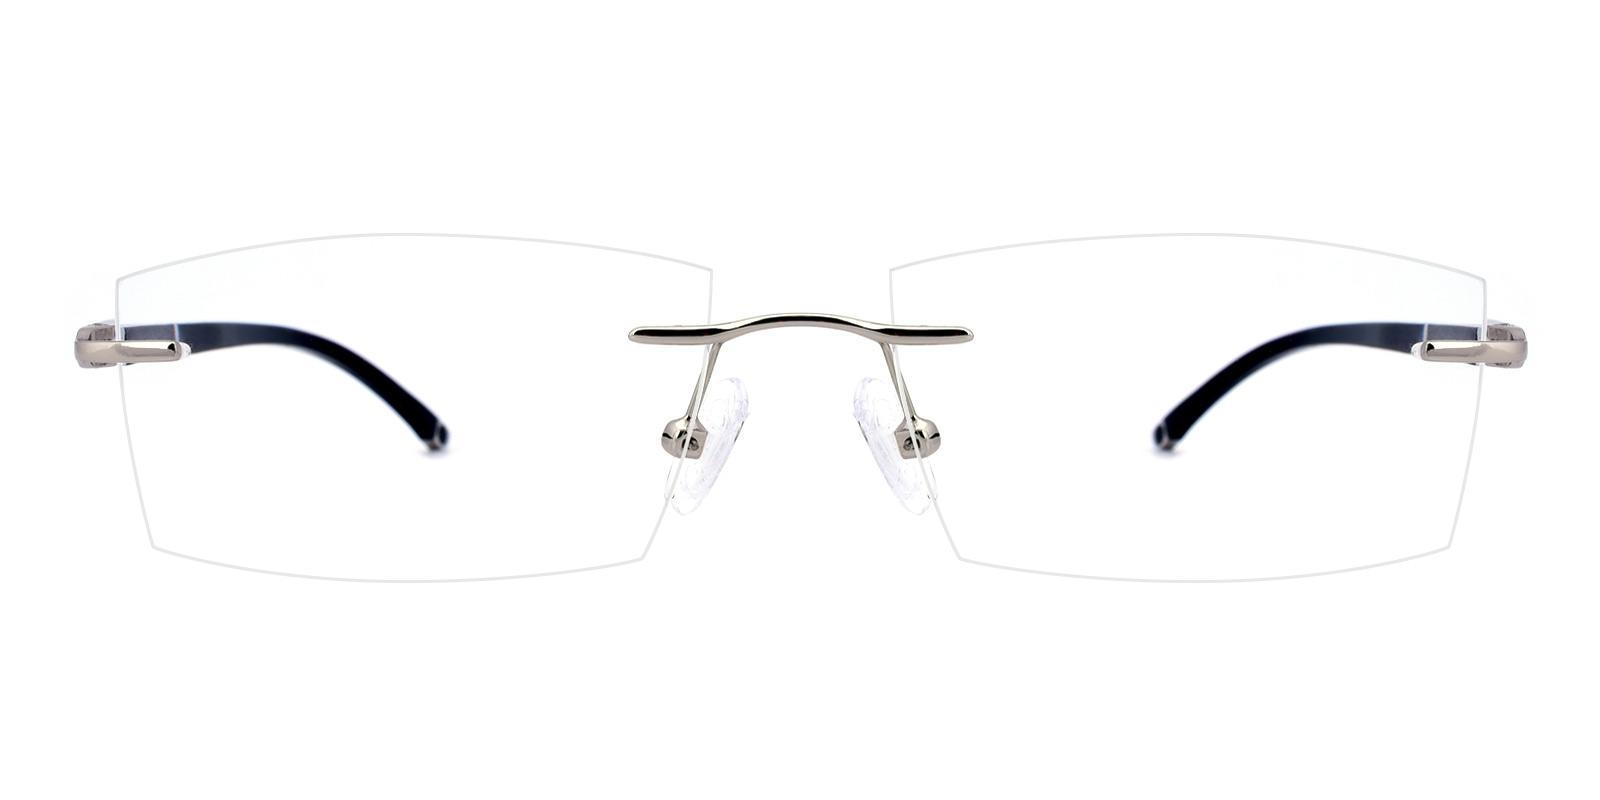 Doumbia-Silver-Varieties-Titanium-Eyeglasses-additional2